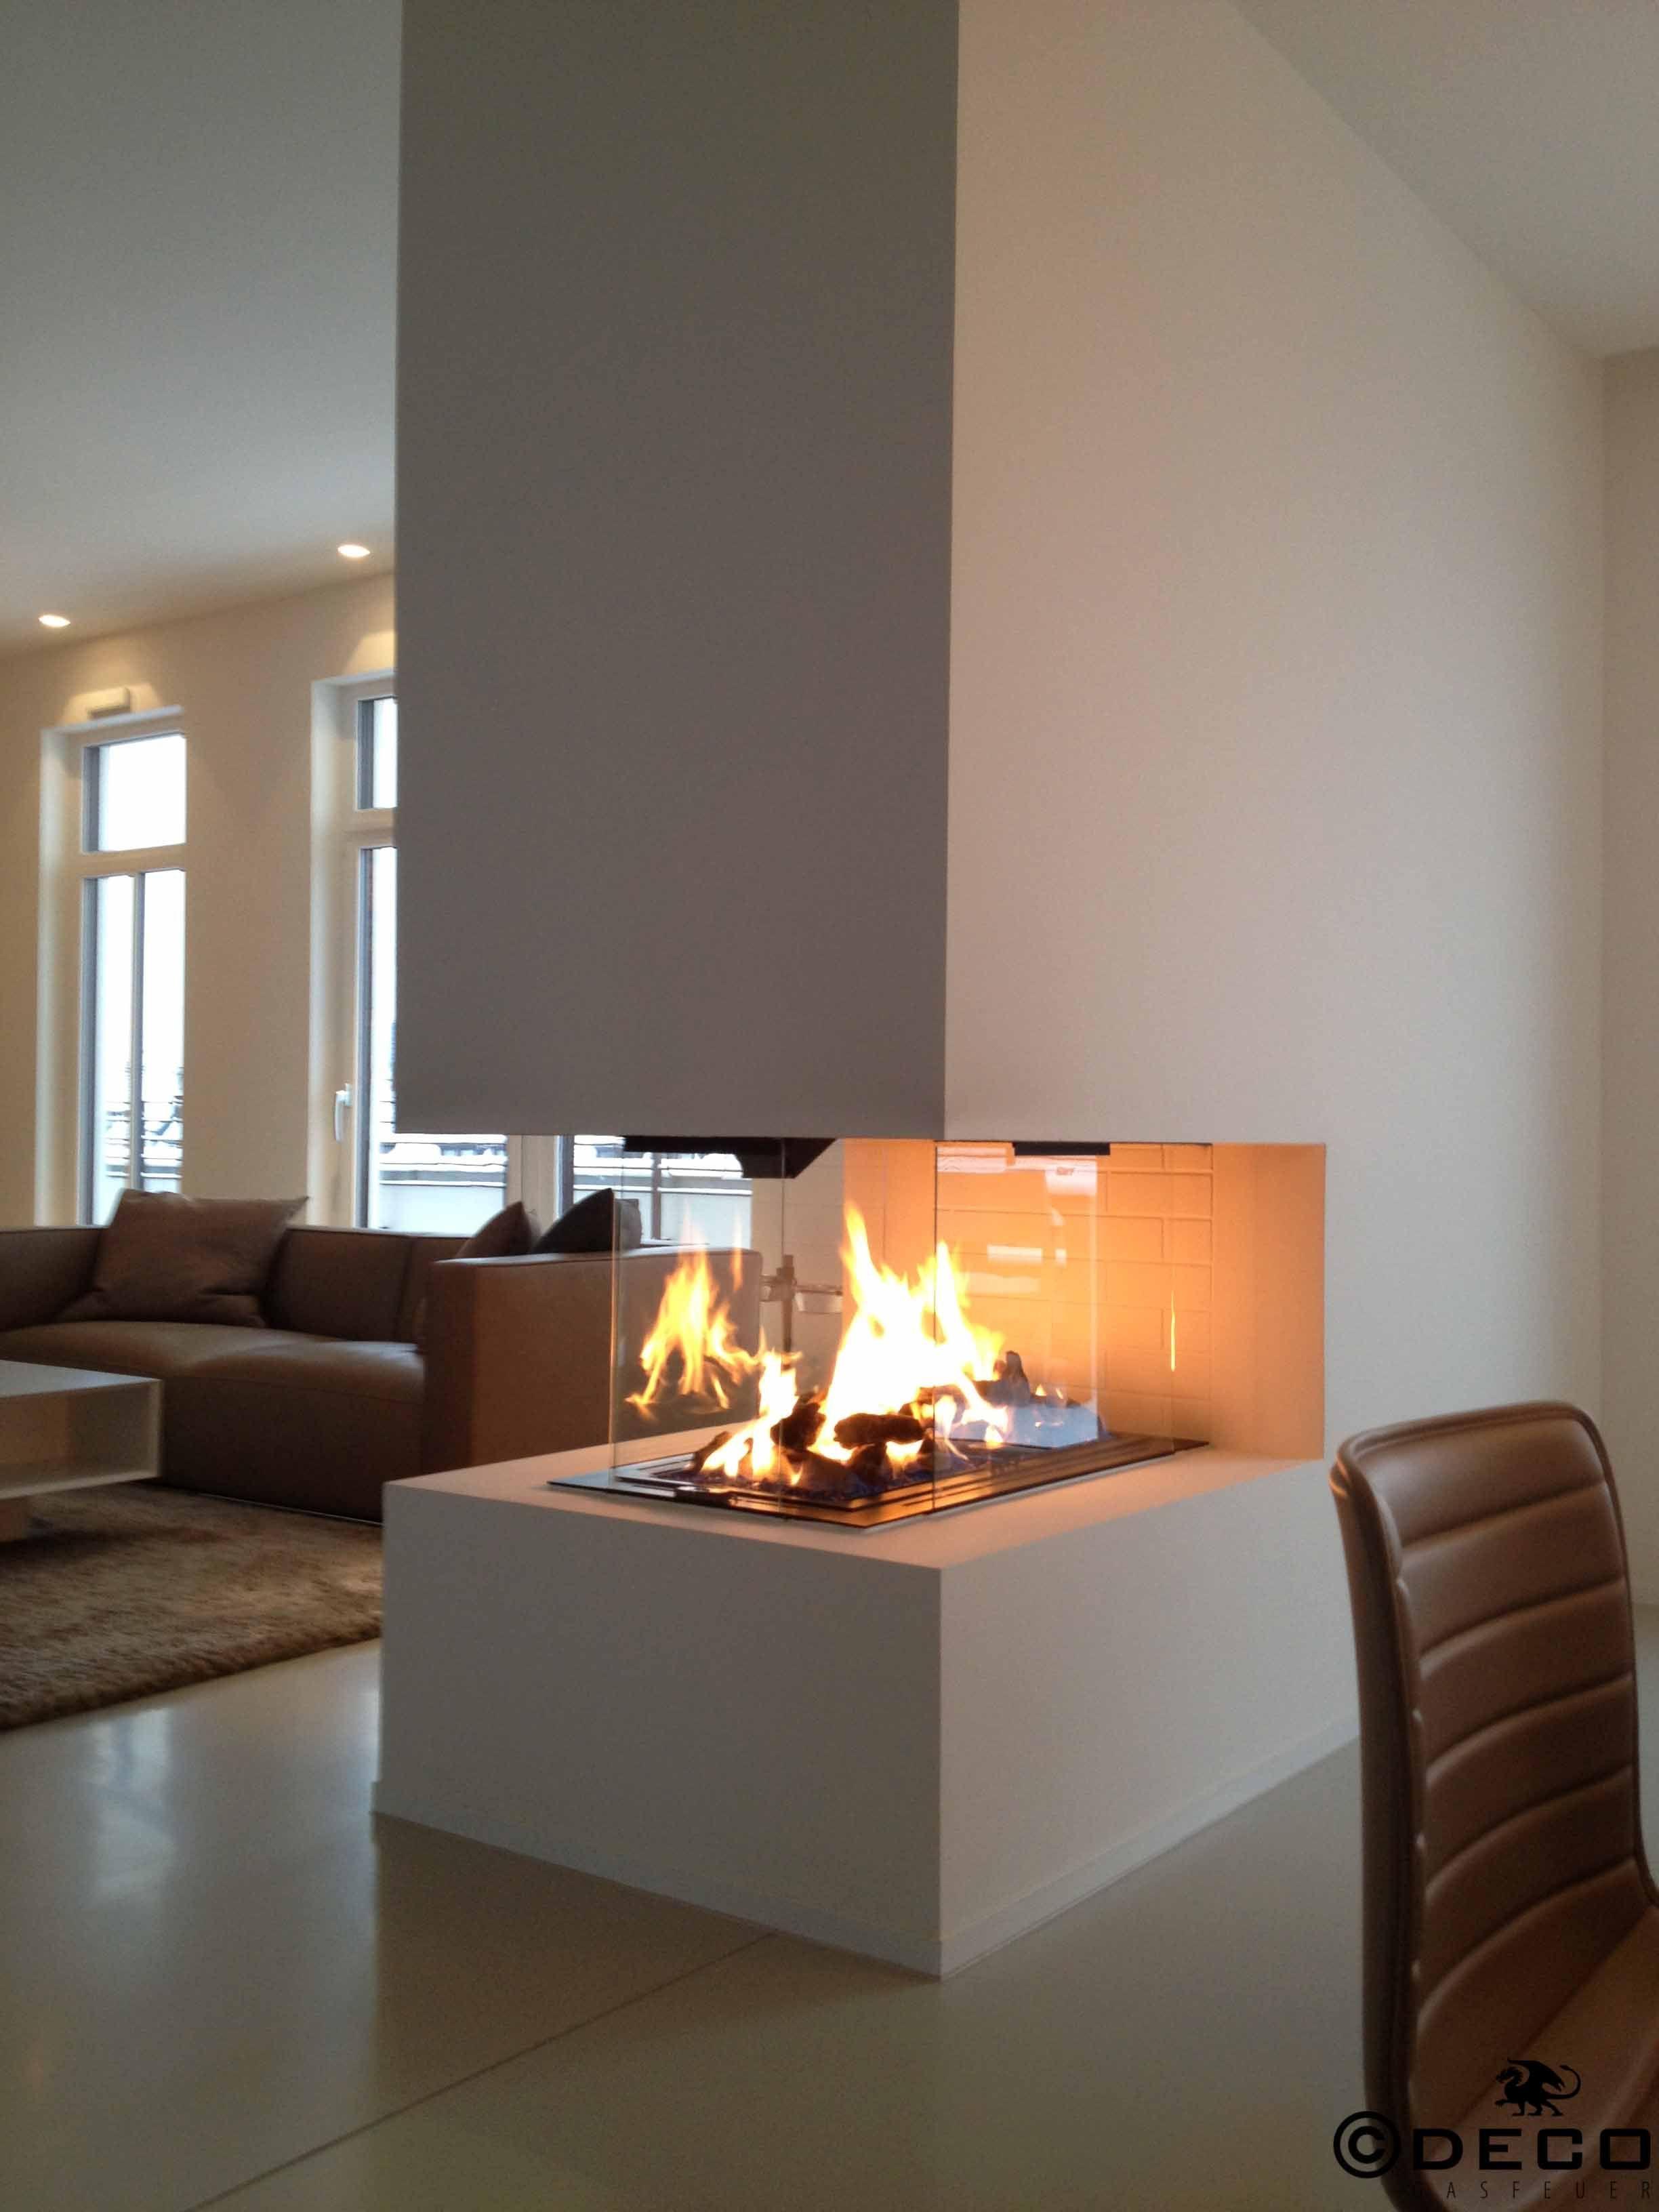 Gasfeuer Gas Fireplace In 2020 Gaskamin Kamin Wohnzimmer Kaminbau